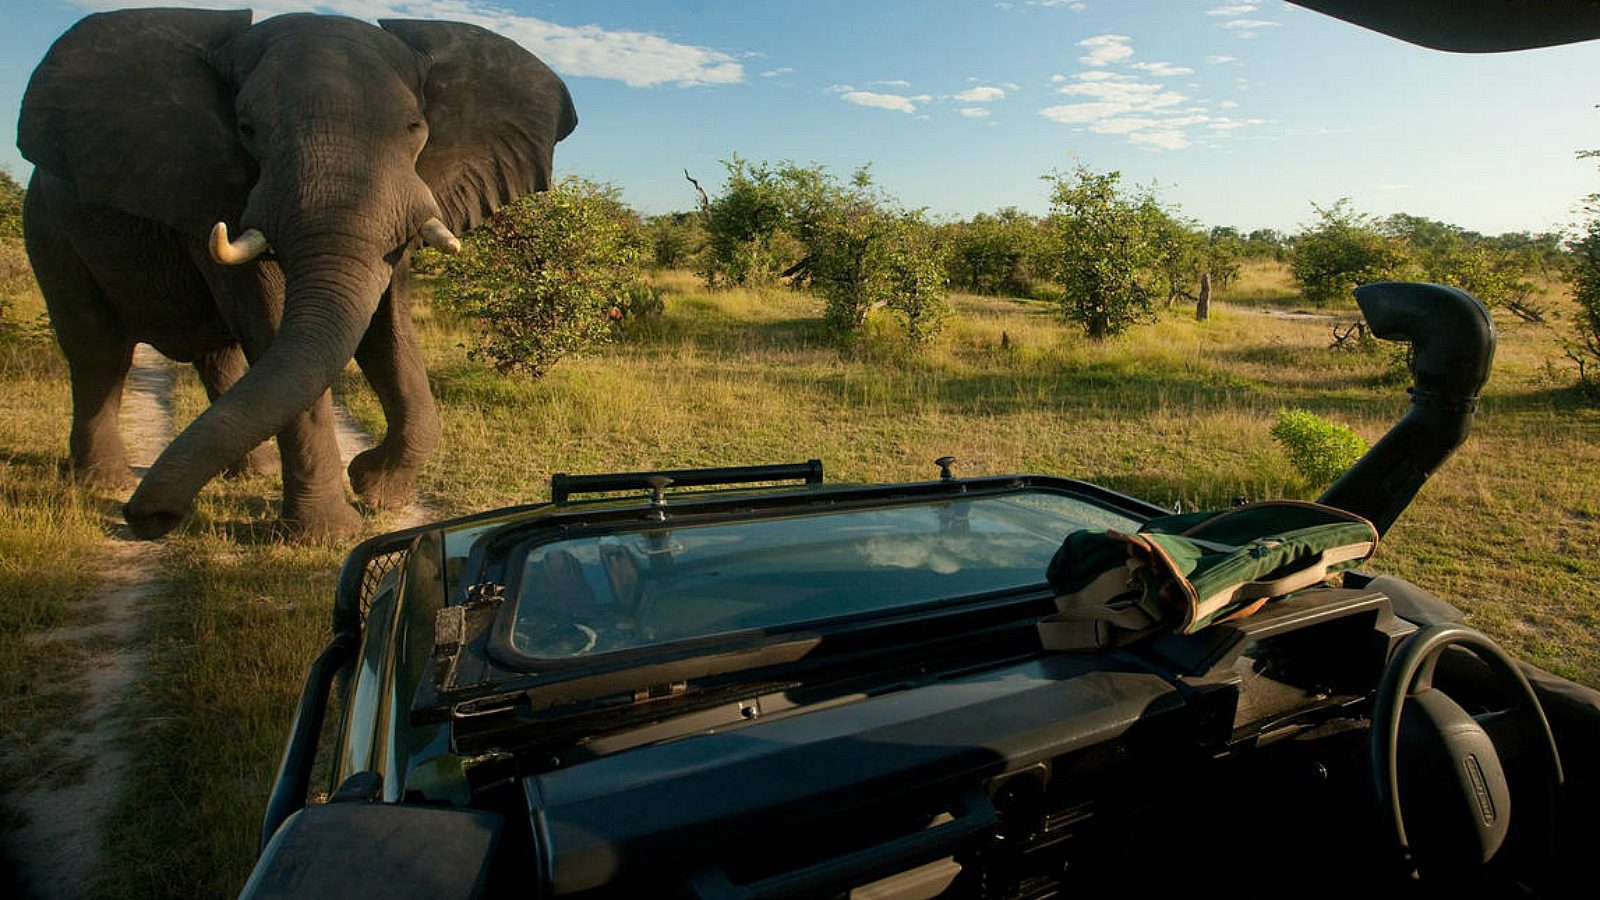 encountering an elephant on game drive zarafa botswana